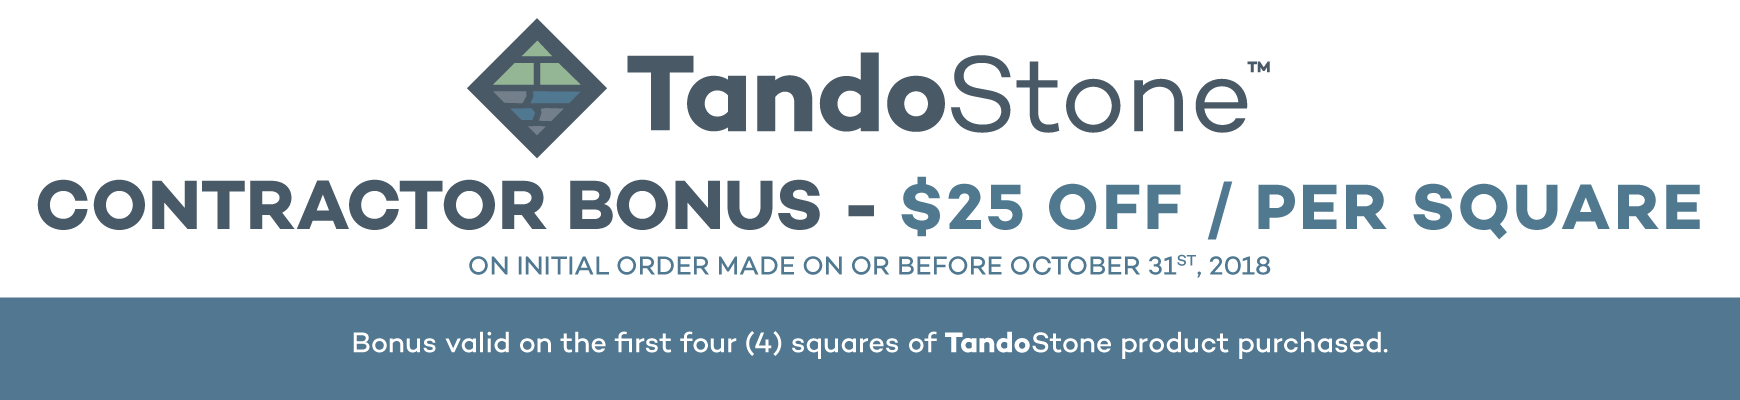 TandoStone_Campaign_ContractorRebate_WebHeader_1700x450-V2-ENG